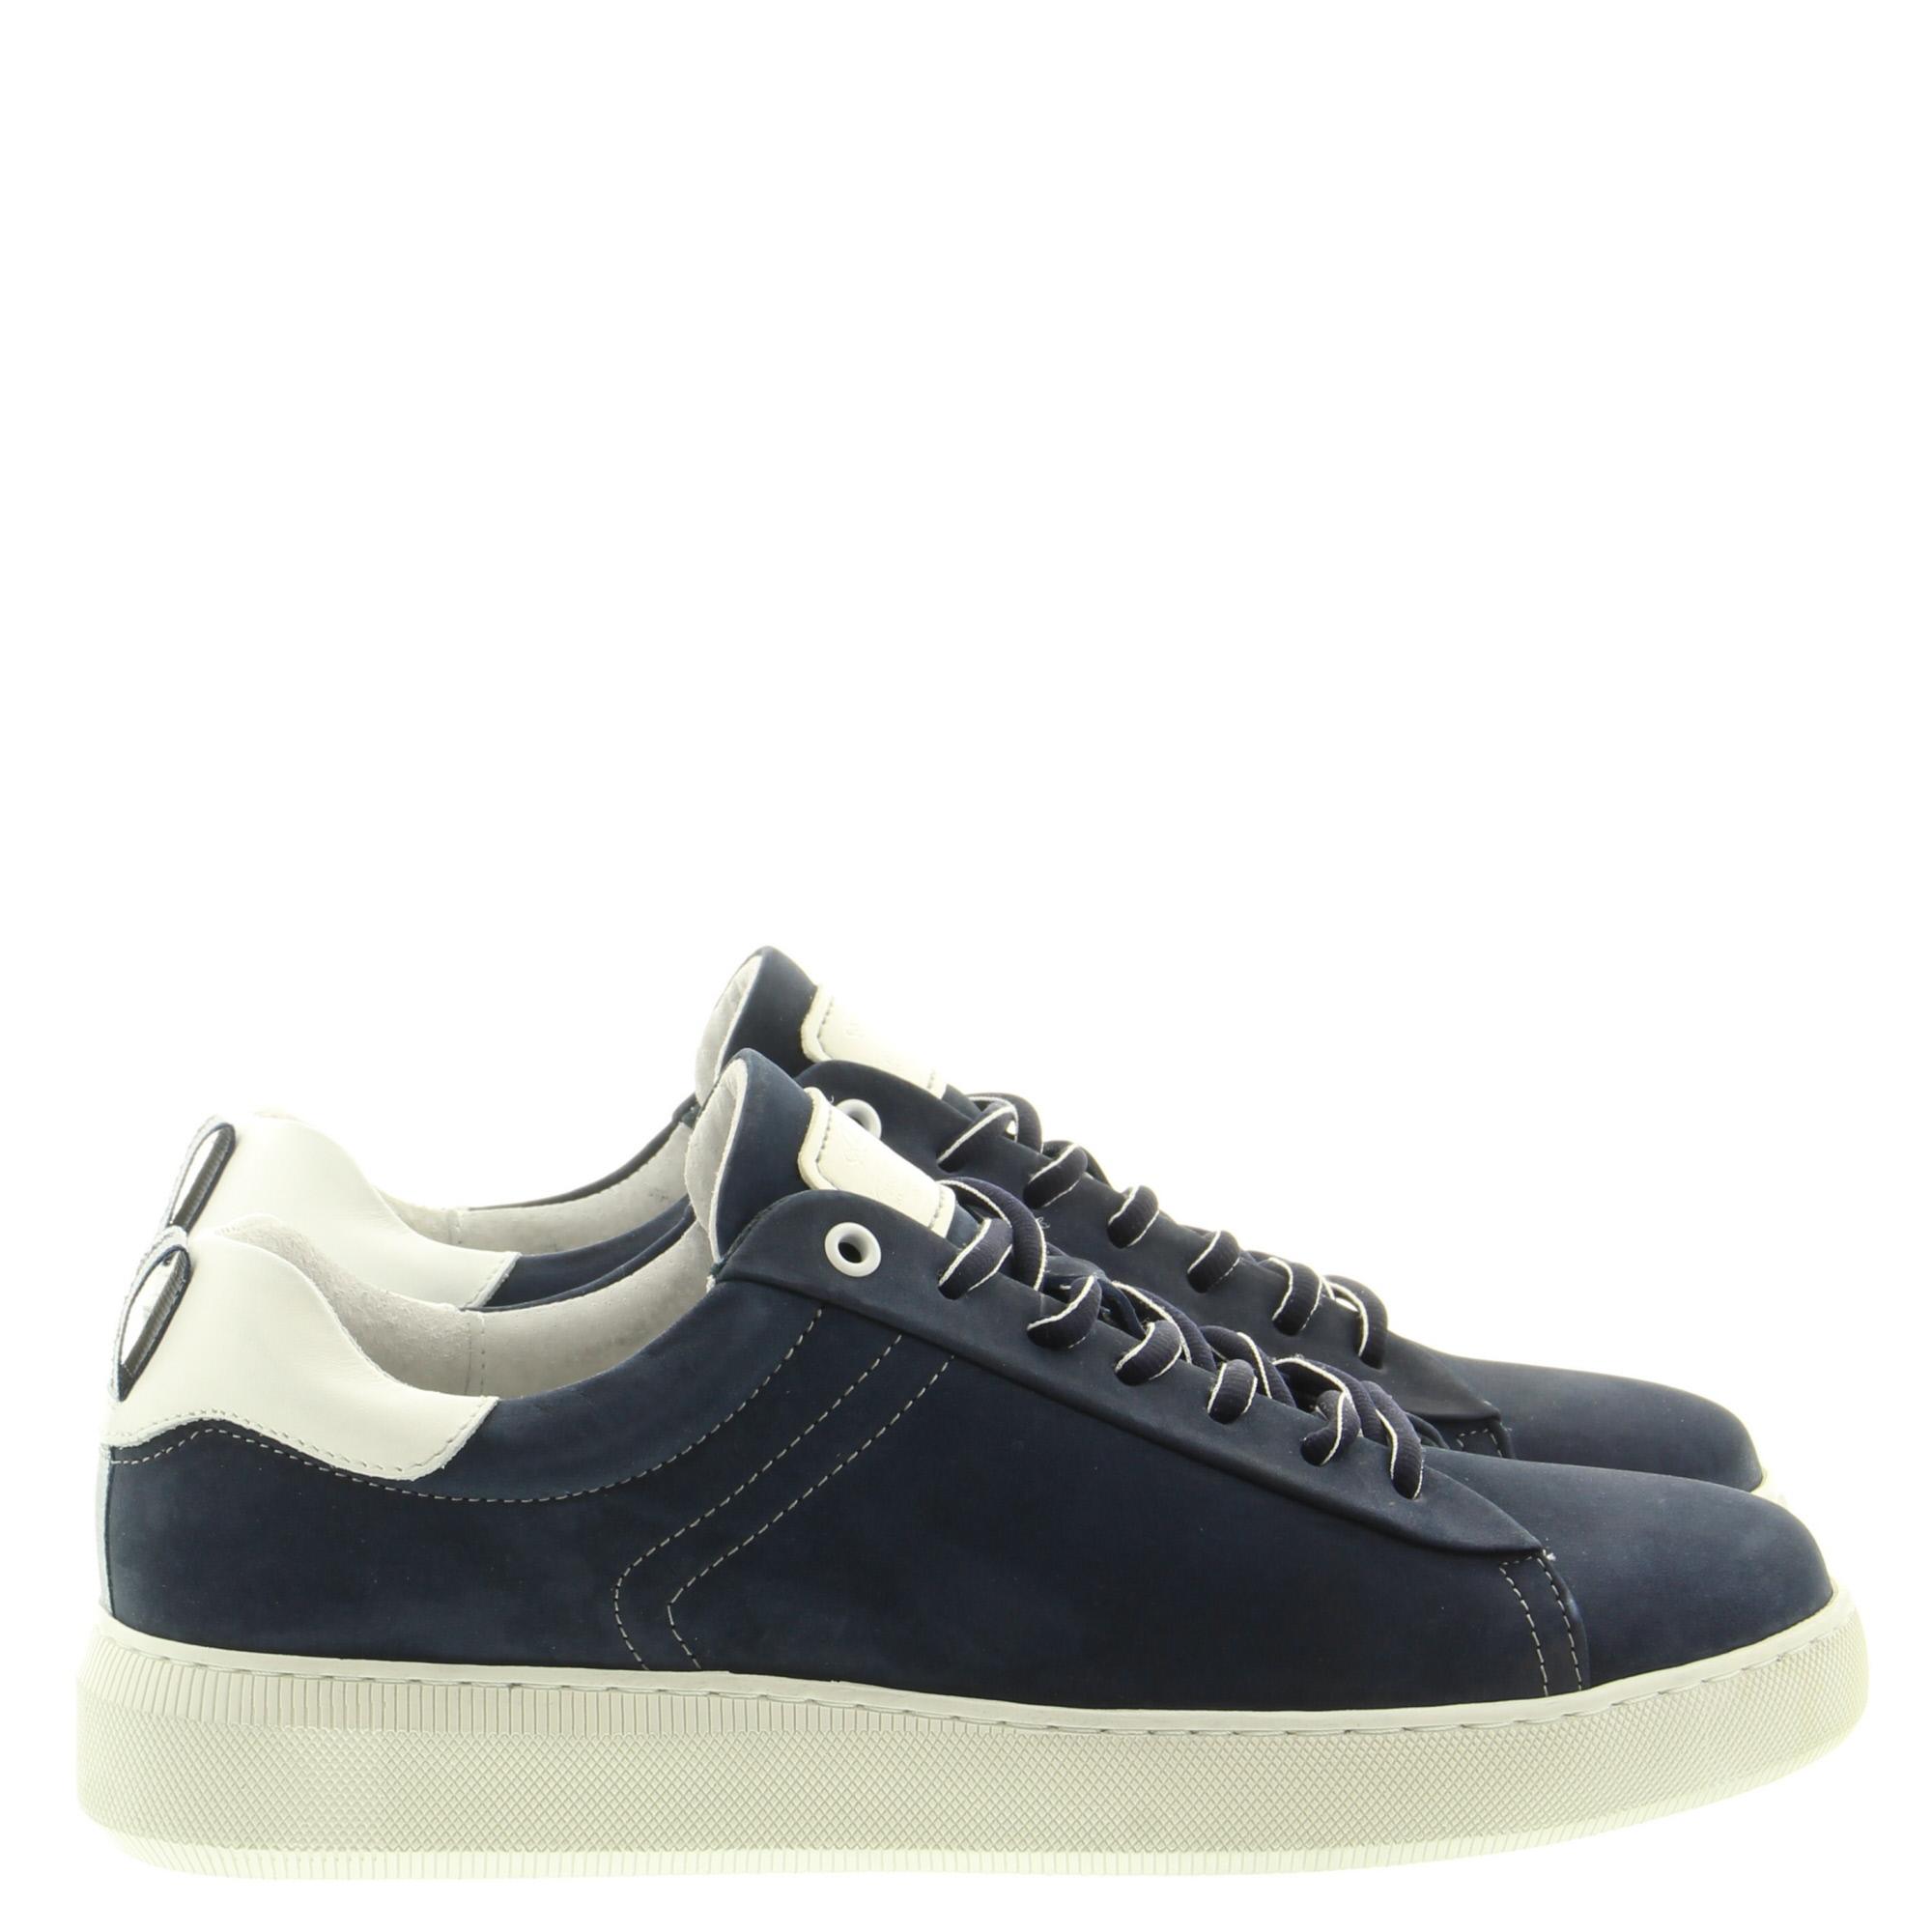 Australian Footwear Gianlucca 15.1522.01 SI9 Ocean